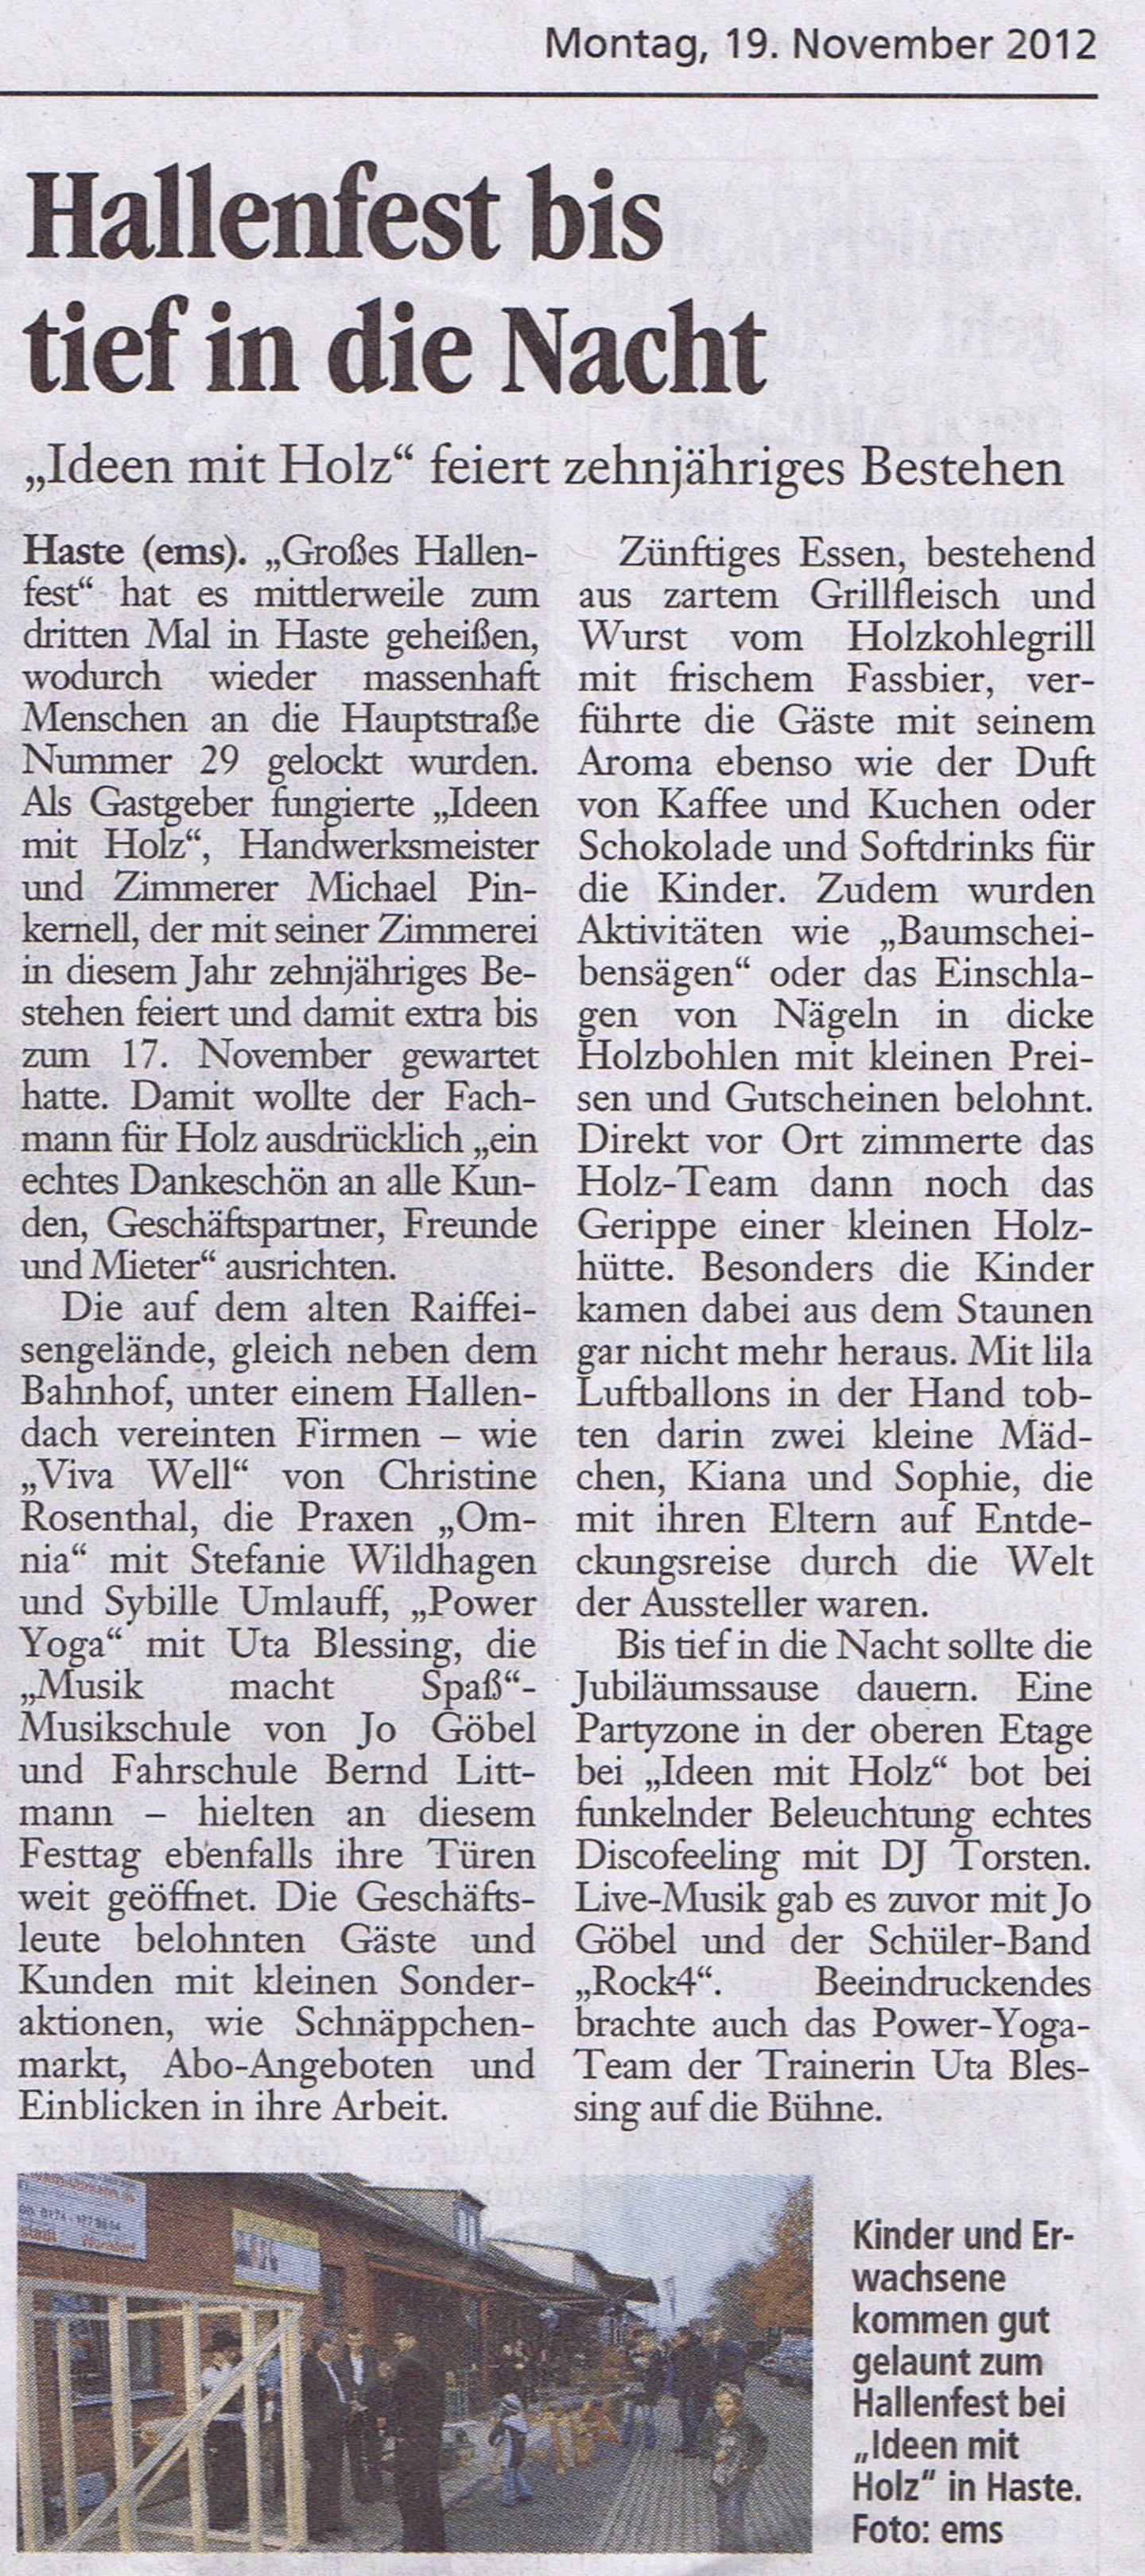 Hallenfest zehnjähriges Bestehen 11-2012 S.N.